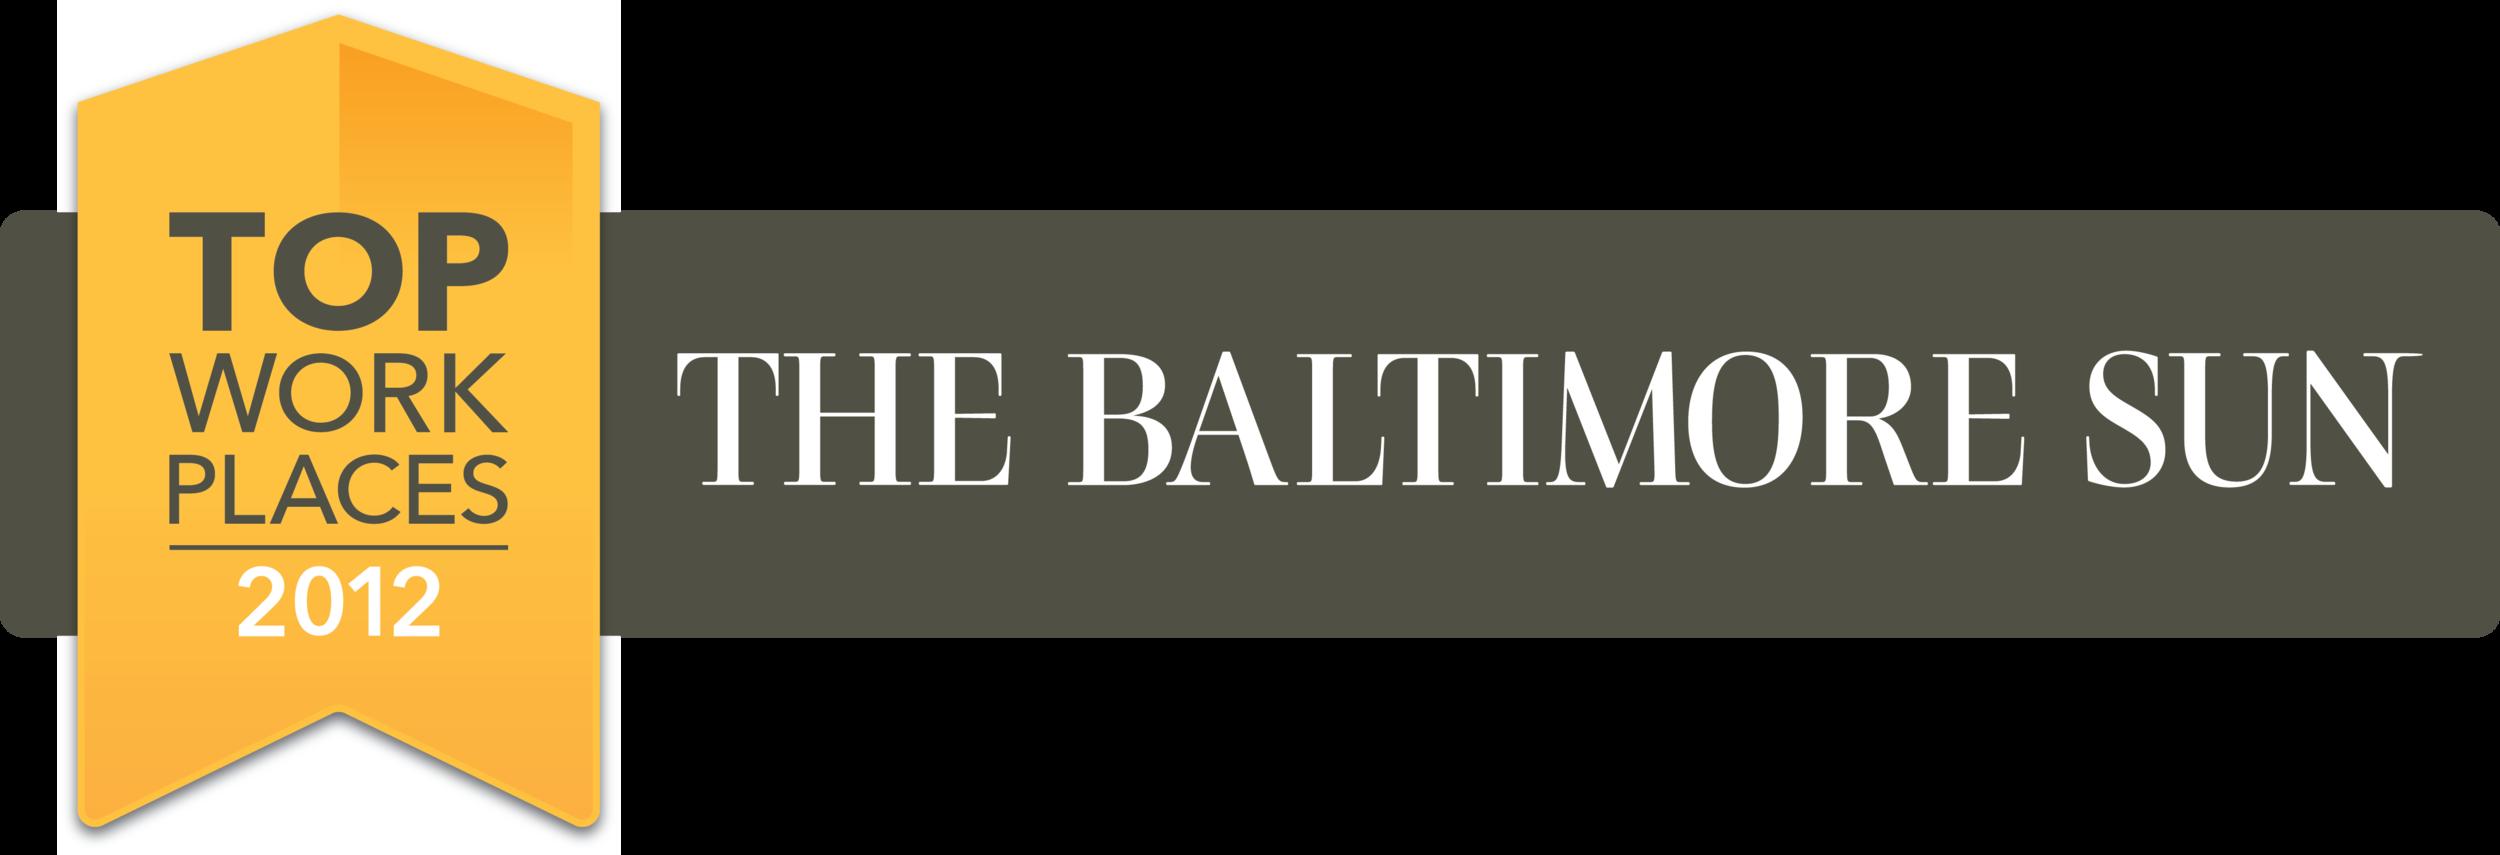 TWP_Baltimore_2012_AW.png